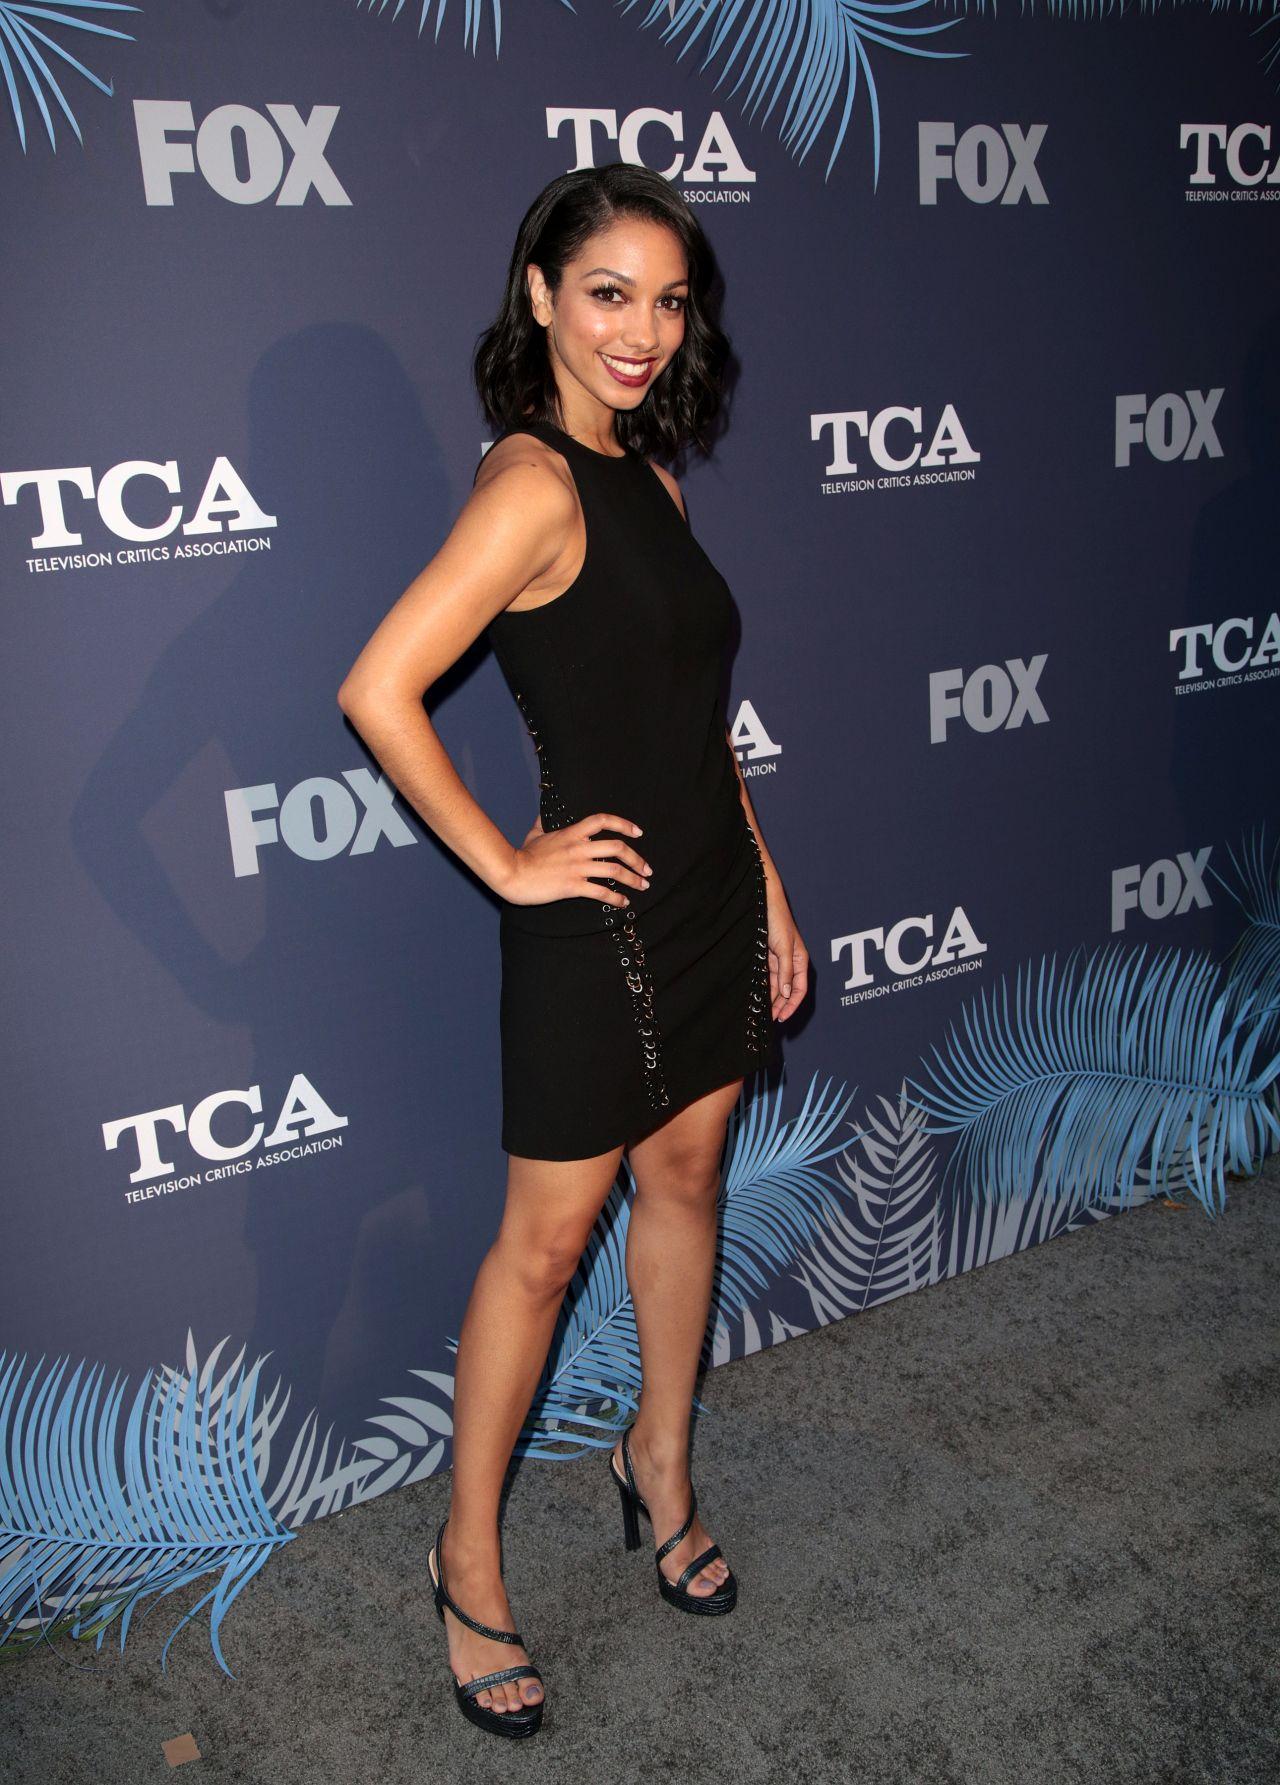 Corinne Foxx Fox Summer Tca 2018 All Star Party In West